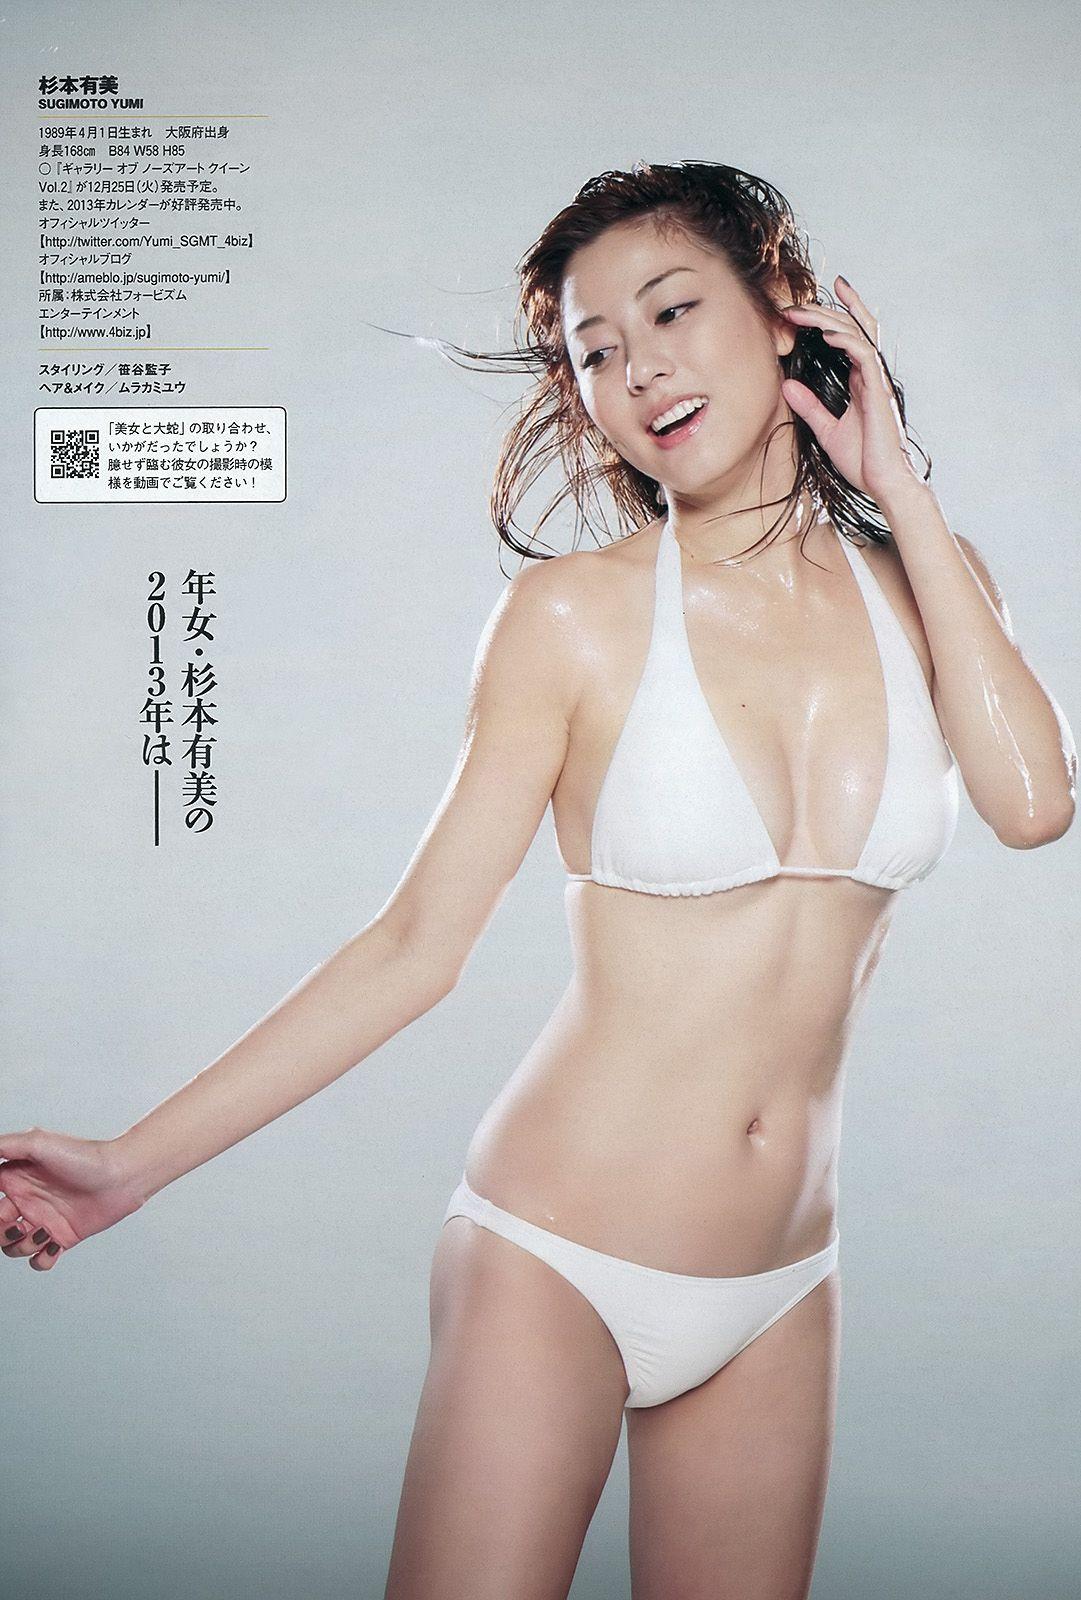 Yumi Sugimoto (b. 1989)